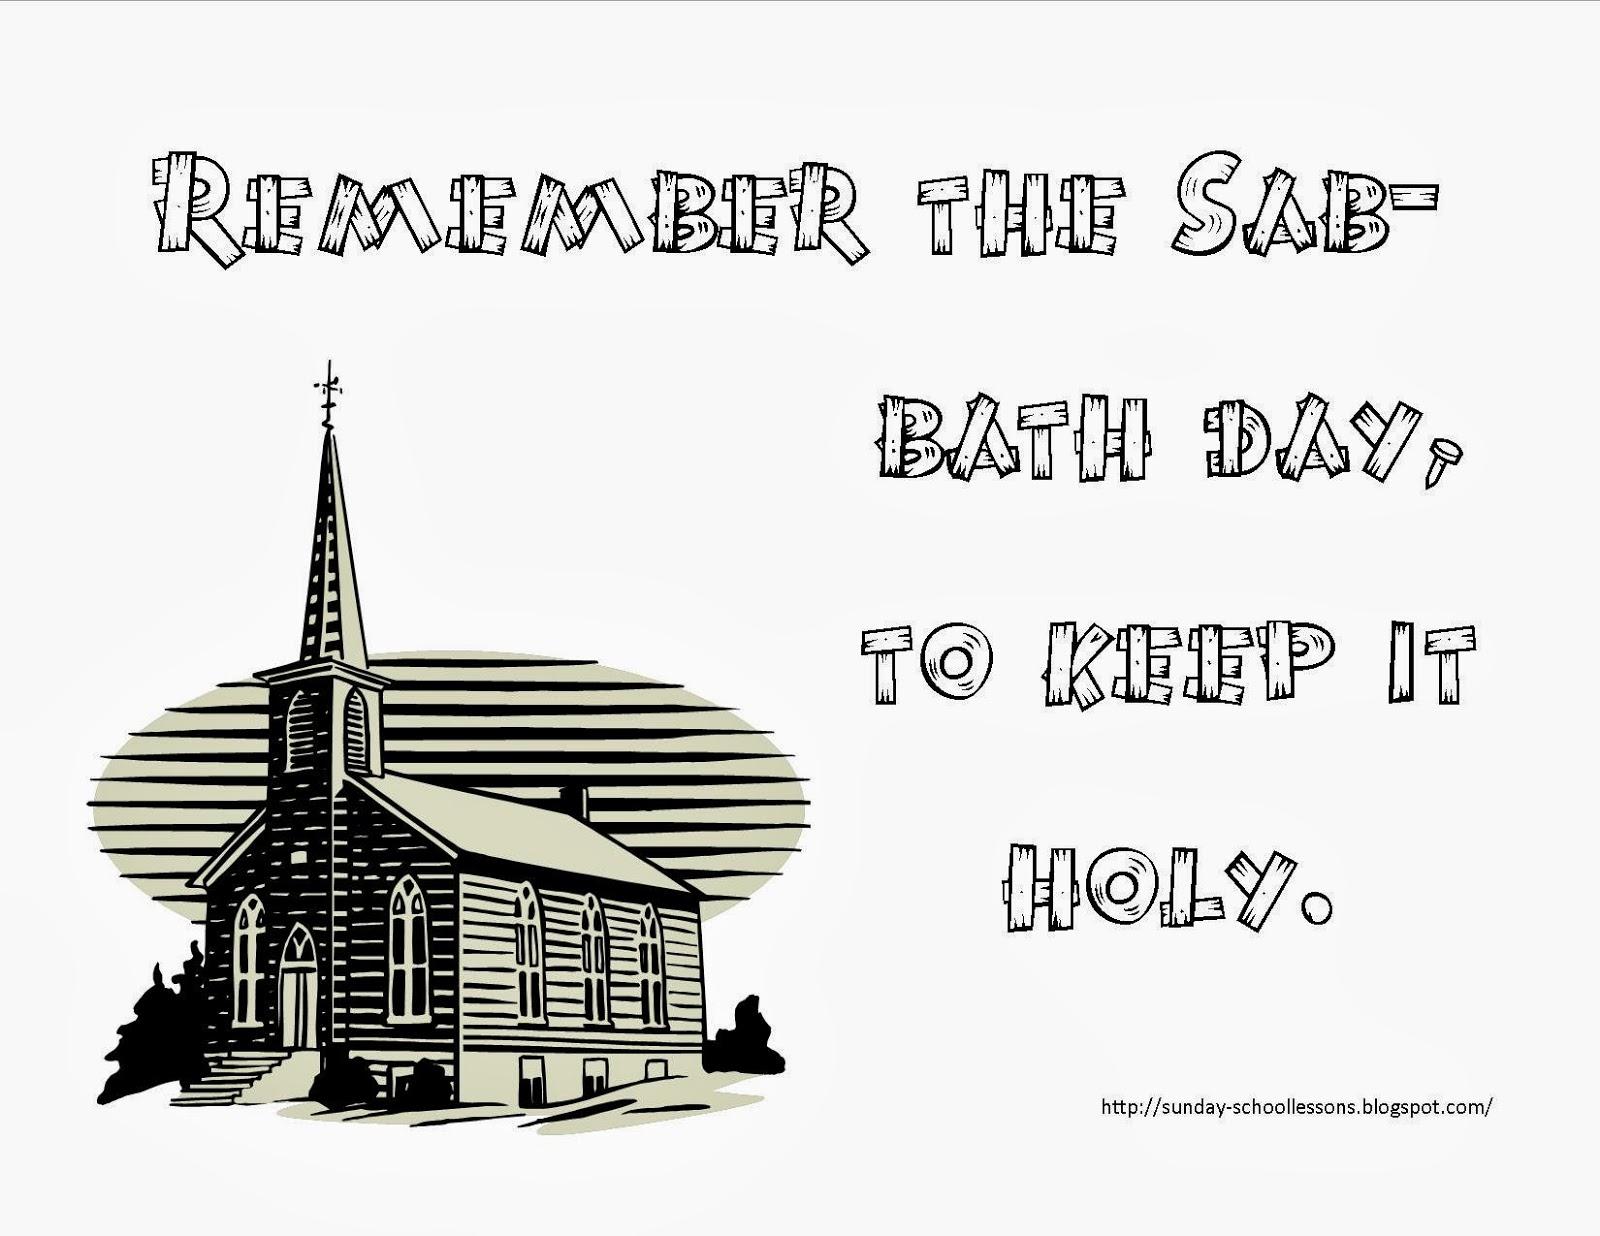 Sunday School Lessons Of Plenty: 10 Commandments